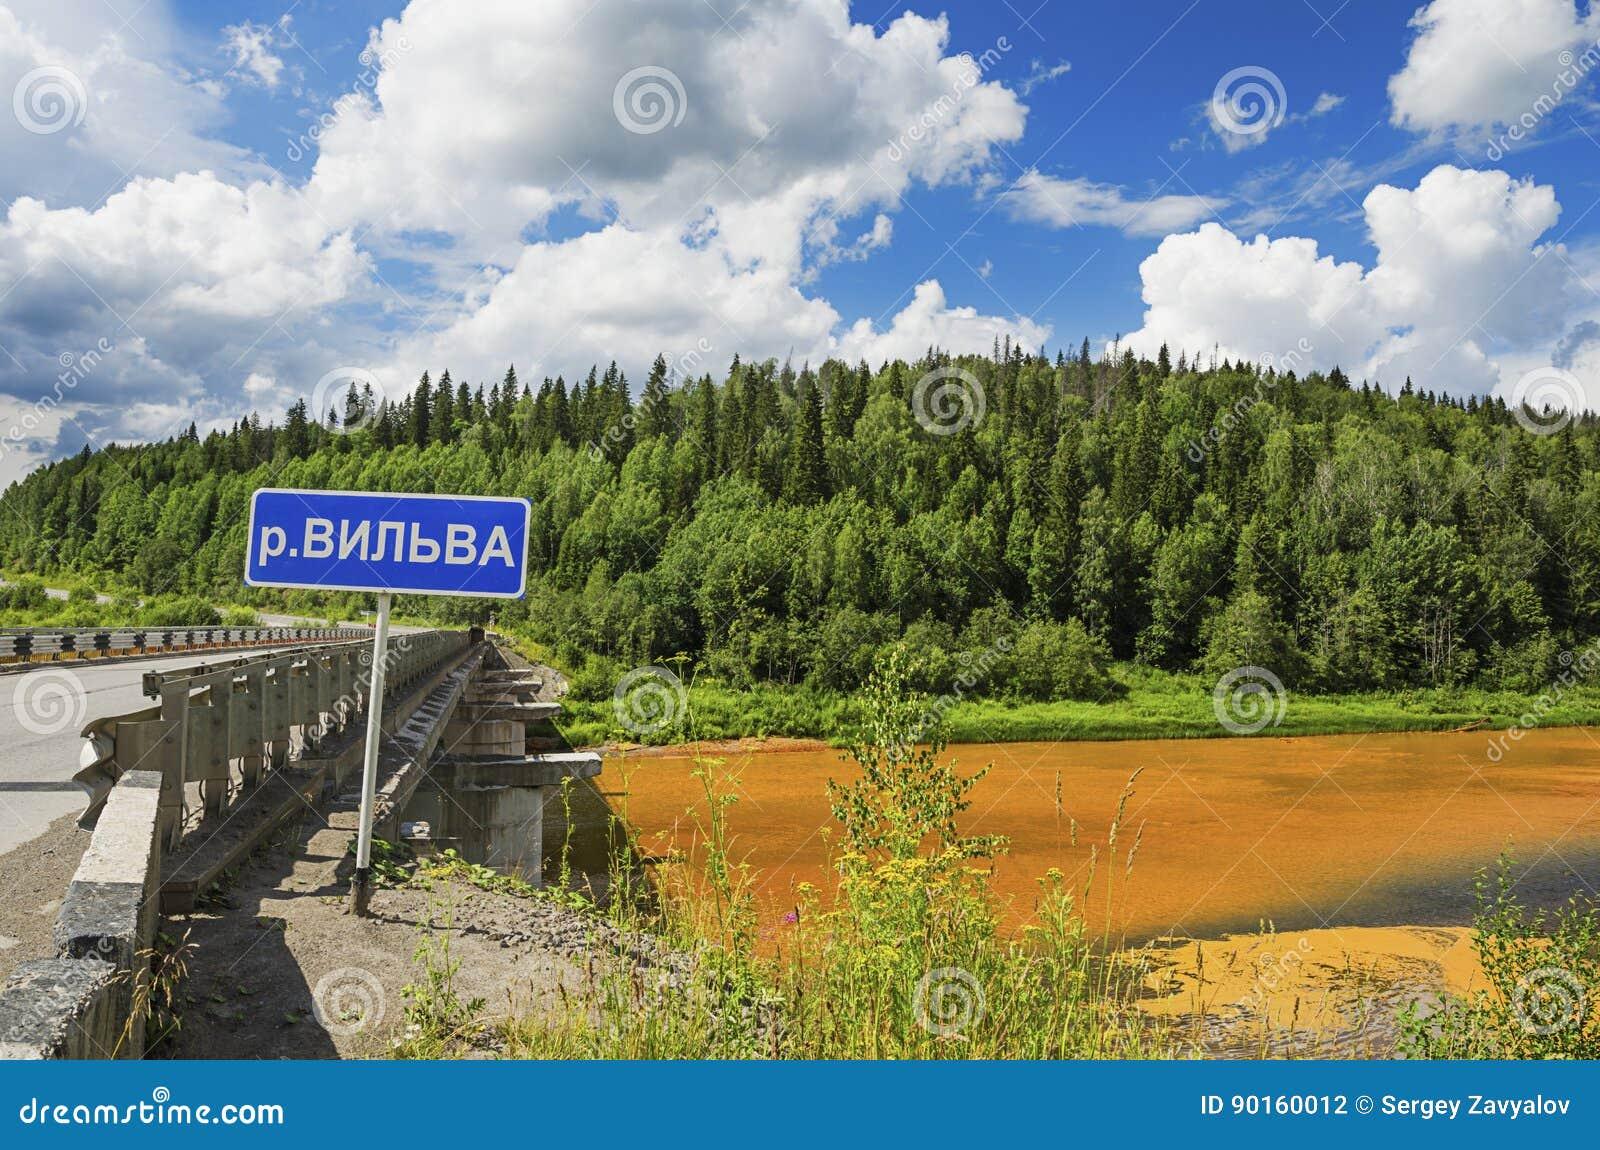 human activities and environmental pollution